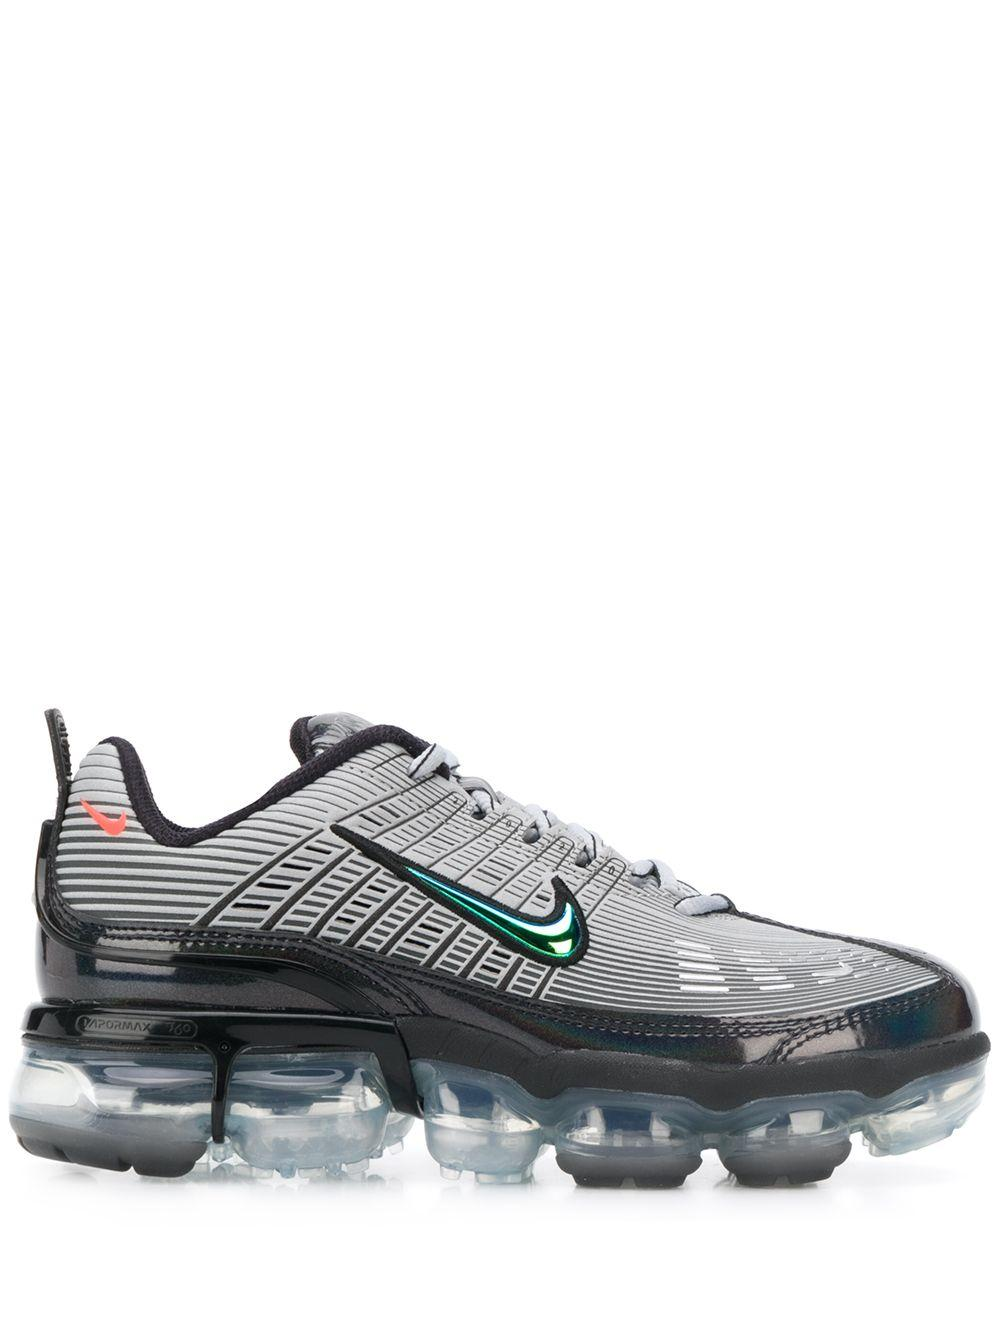 Baskets à semelle transparente Nike - Lyst